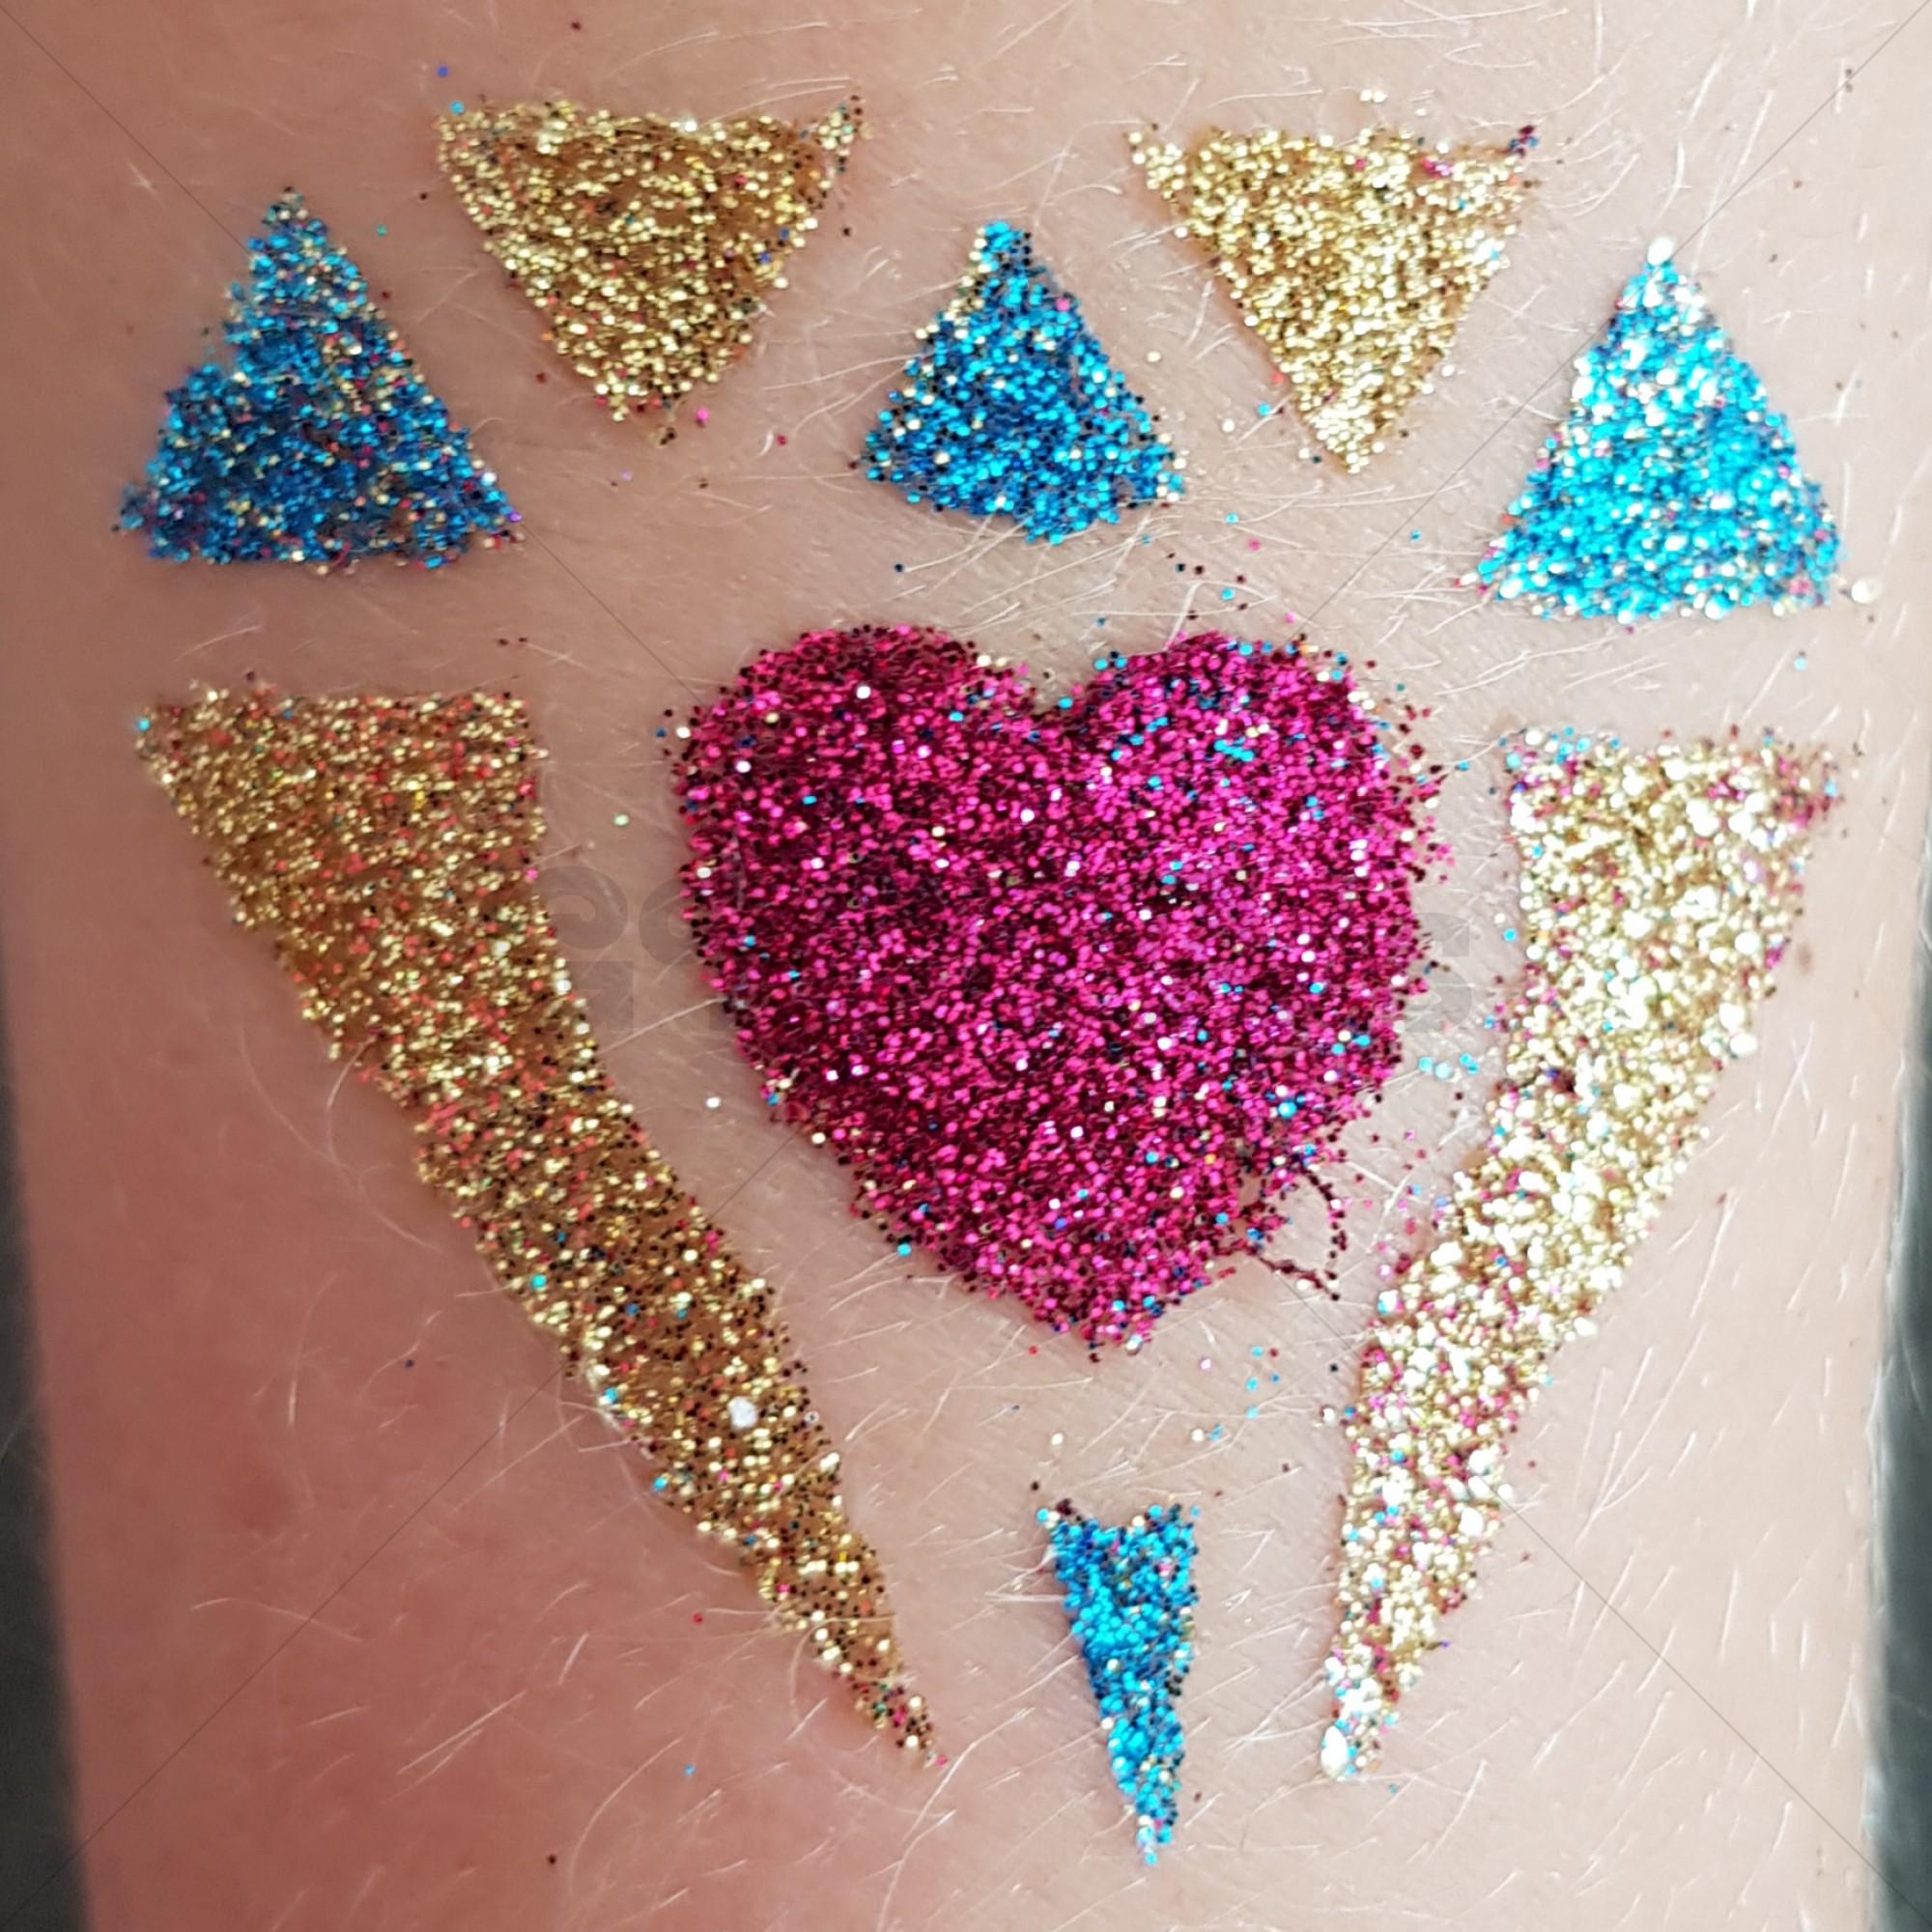 Glitter tattoo pakket (huidlijm, glitters, kwasten, 50 sjablonen)